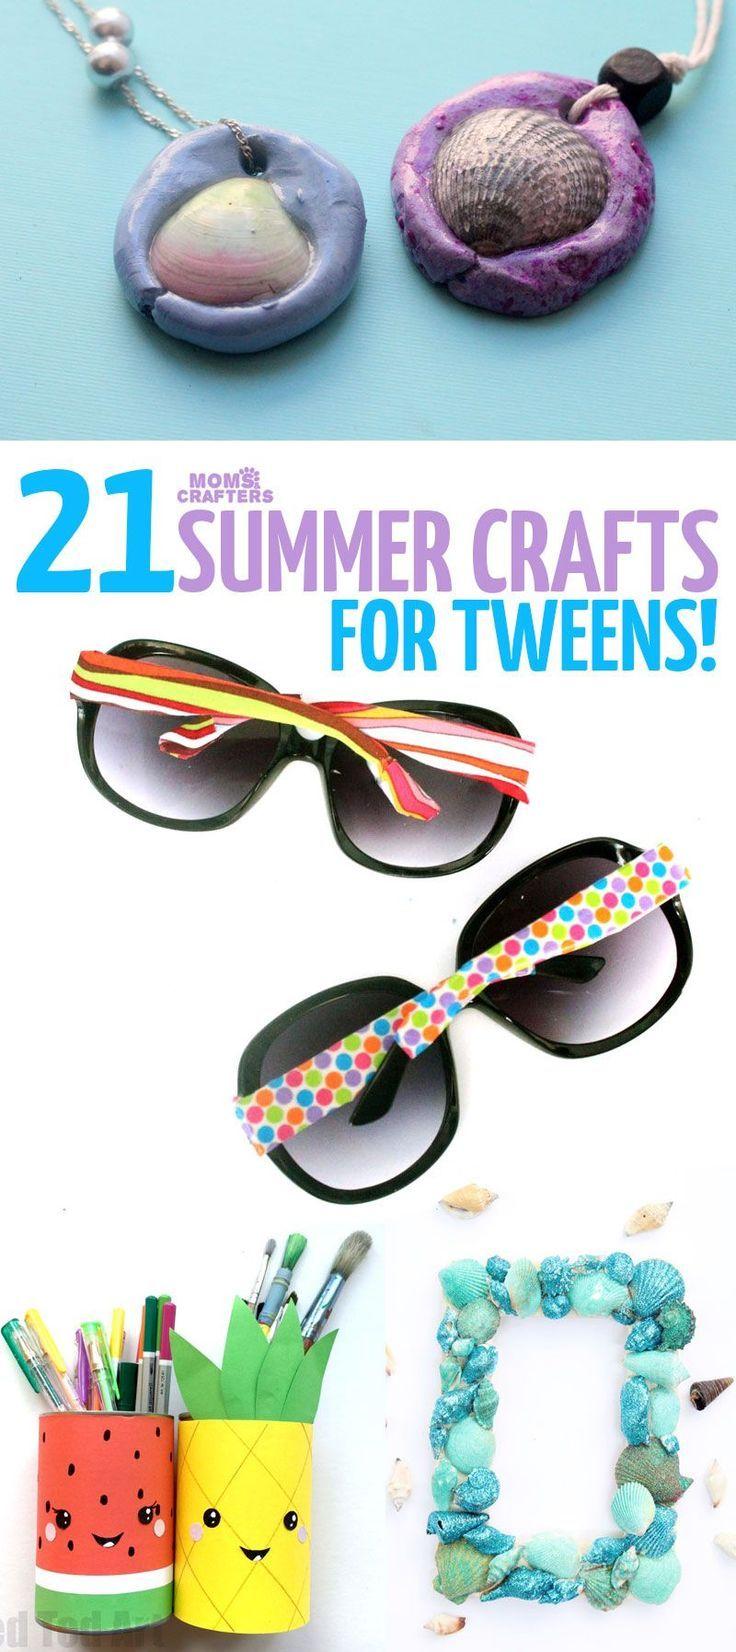 21 Summer Crafts For Tweens Seashellcrafts Forteens Genel